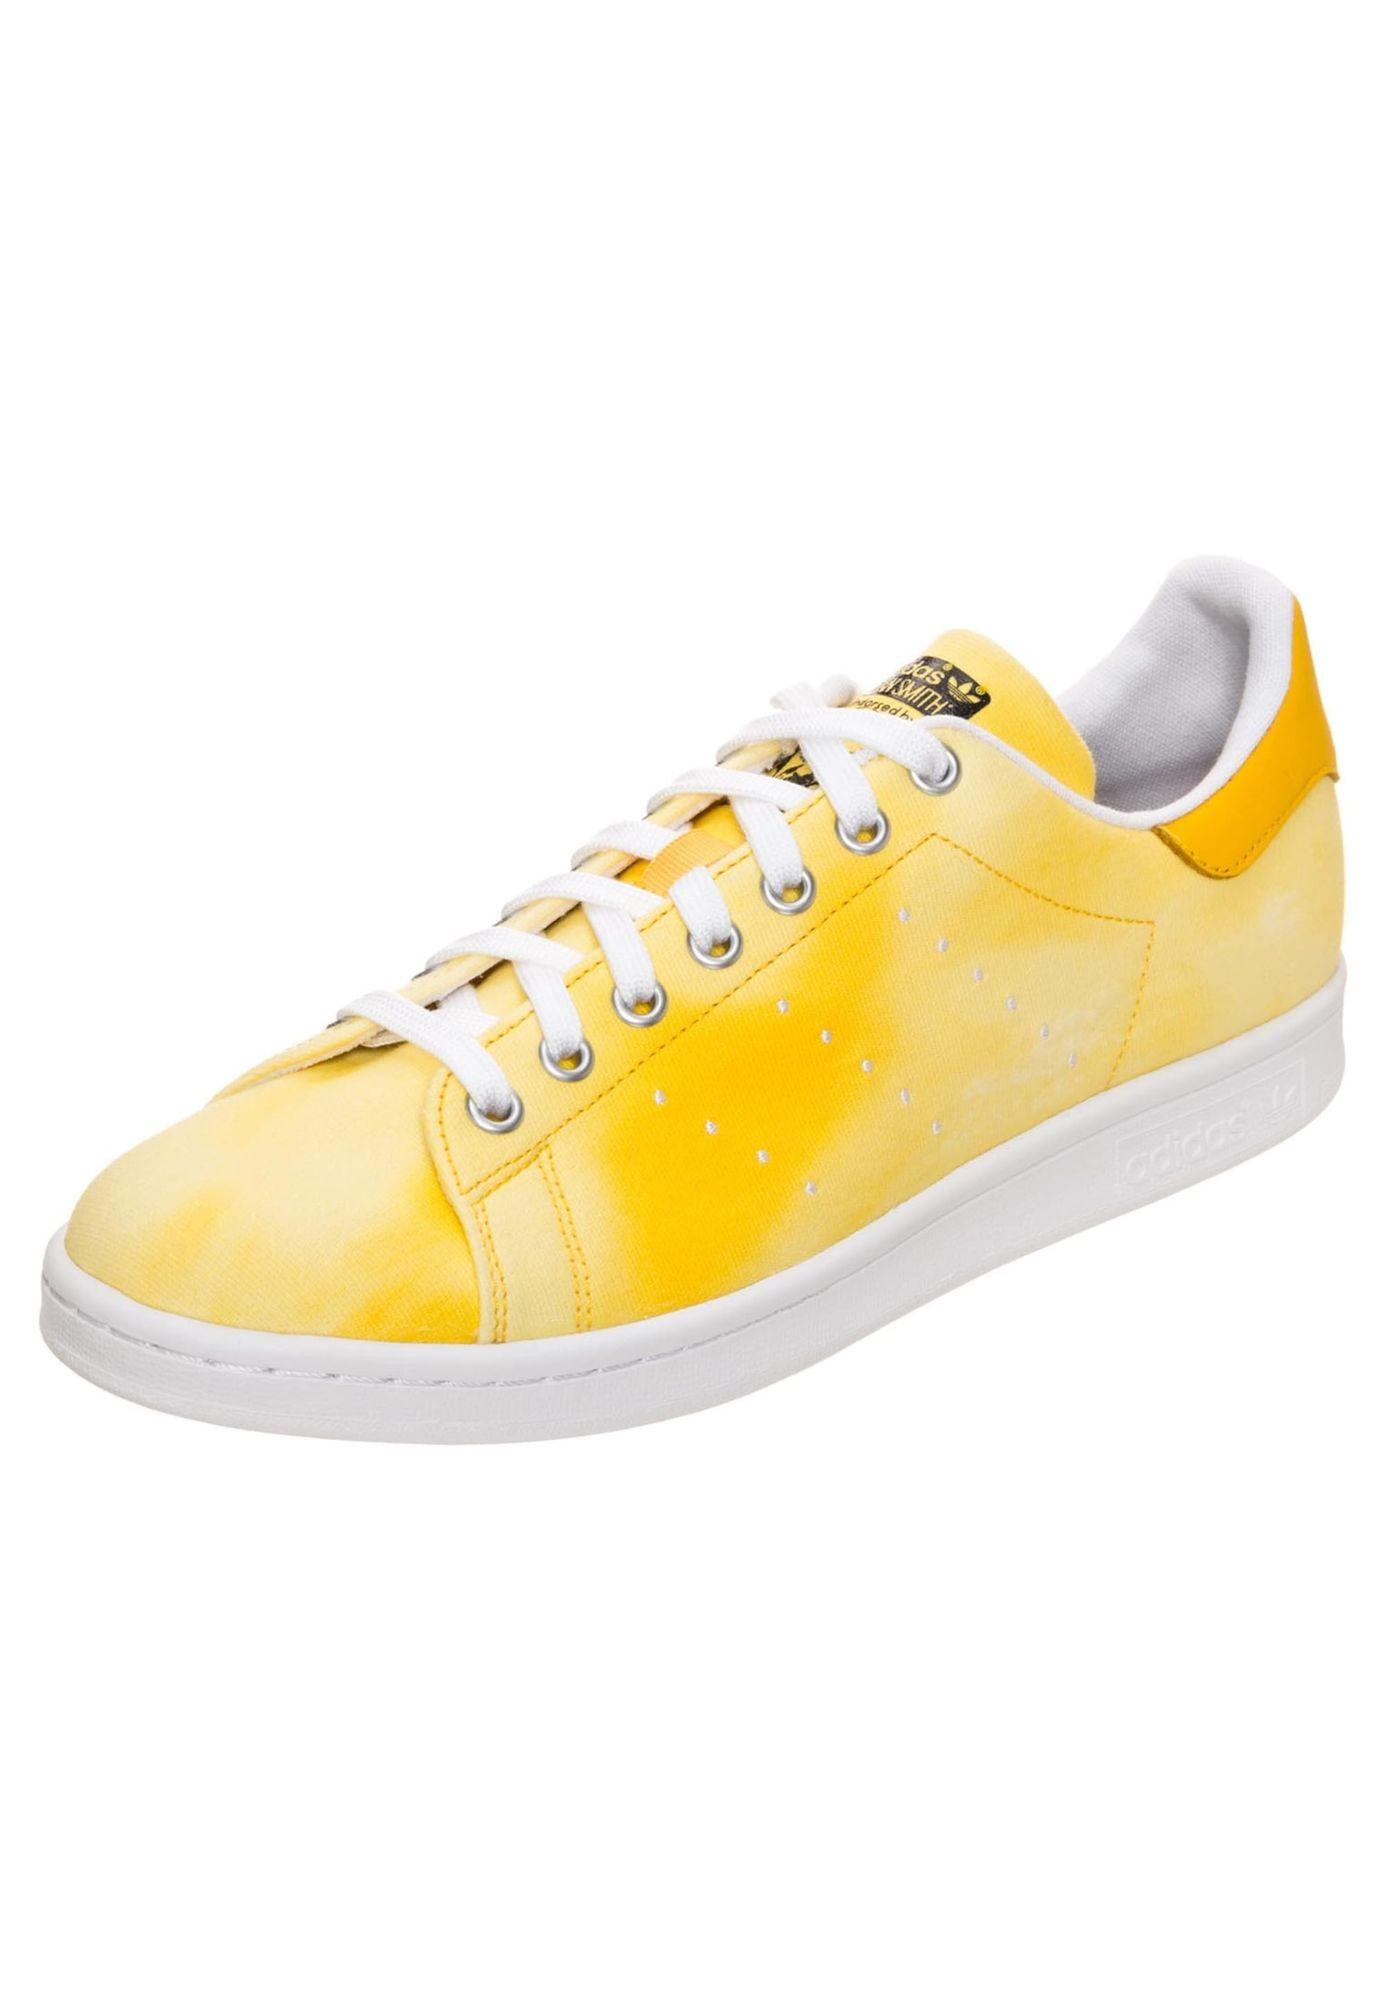 Sneaker ´PW HU Holi Stan Smith Unisex´